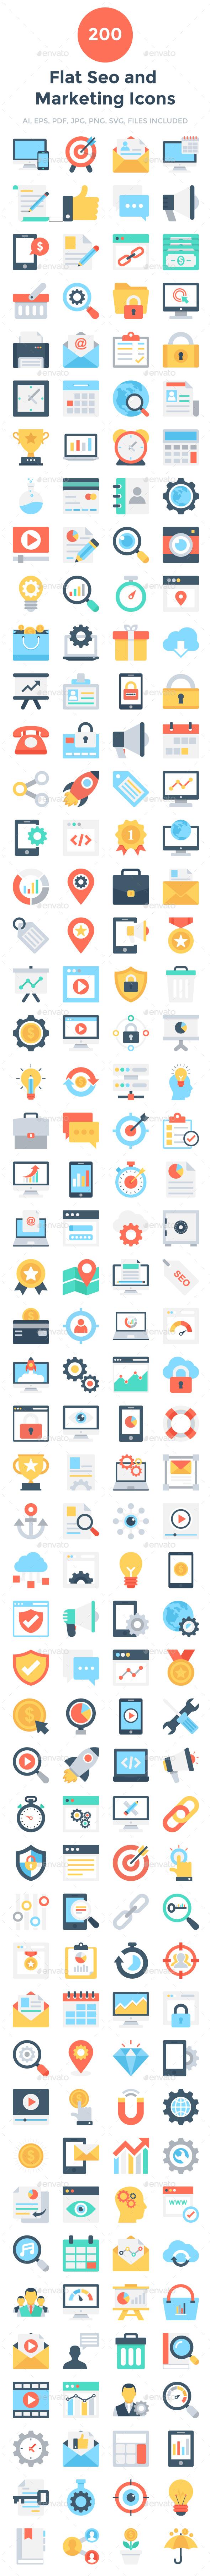 200 Flat Seo and Marketing Icons - Icons